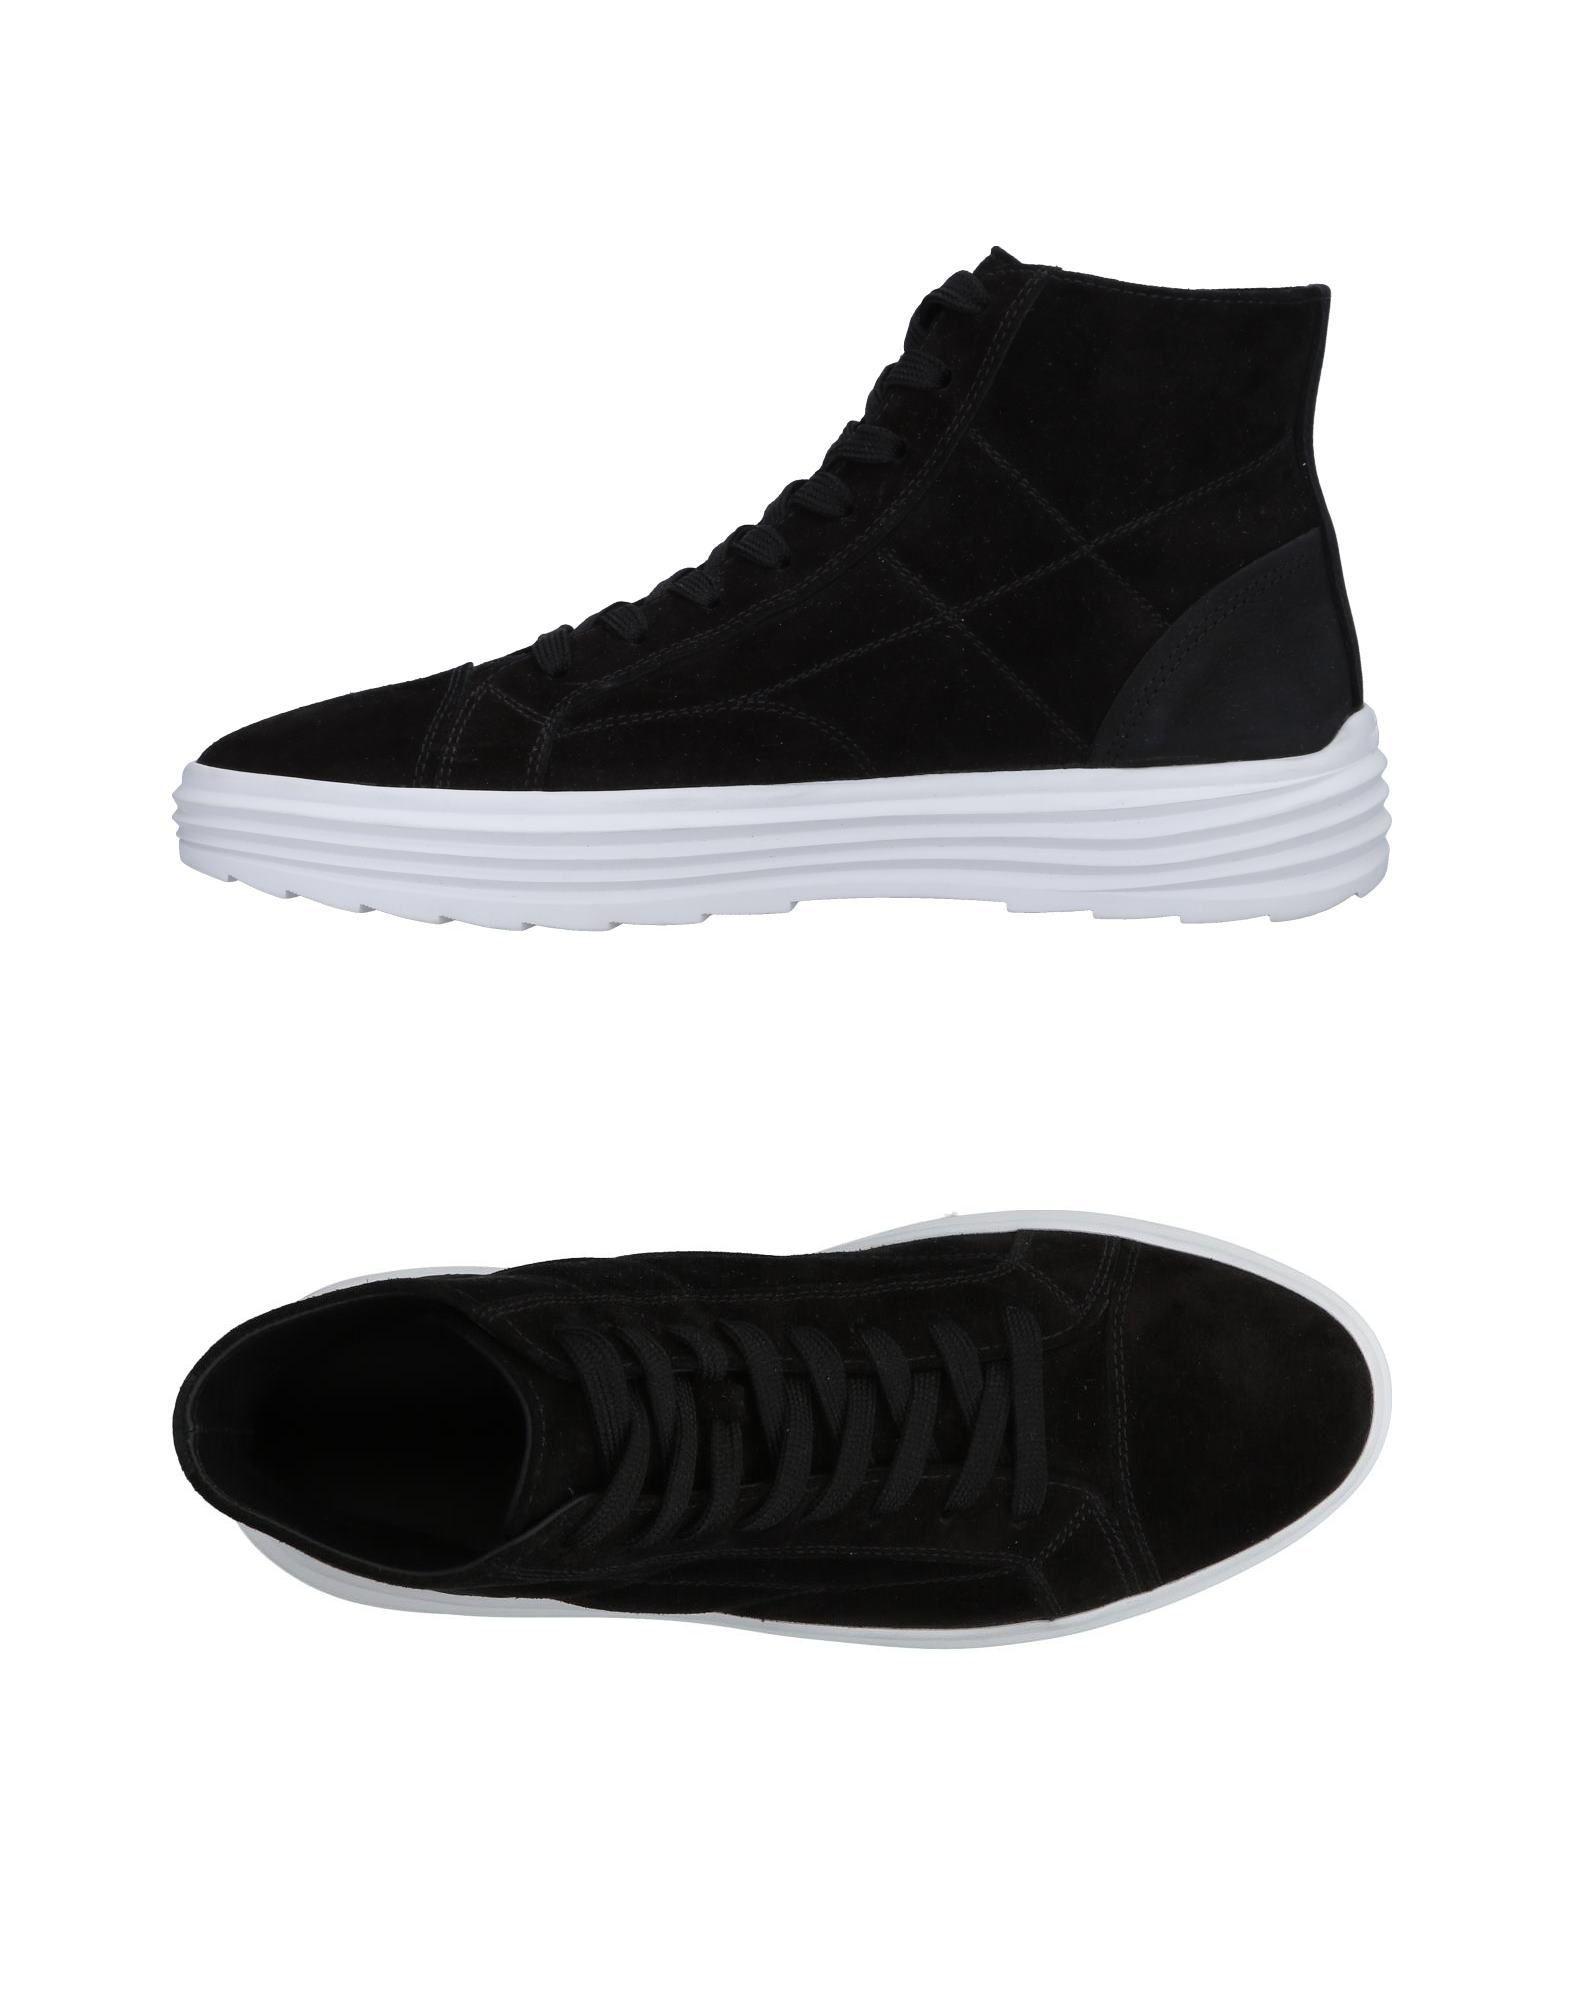 Moda Sneakers Sneakers Moda Hogan Uomo - 11497110WW cd93b7